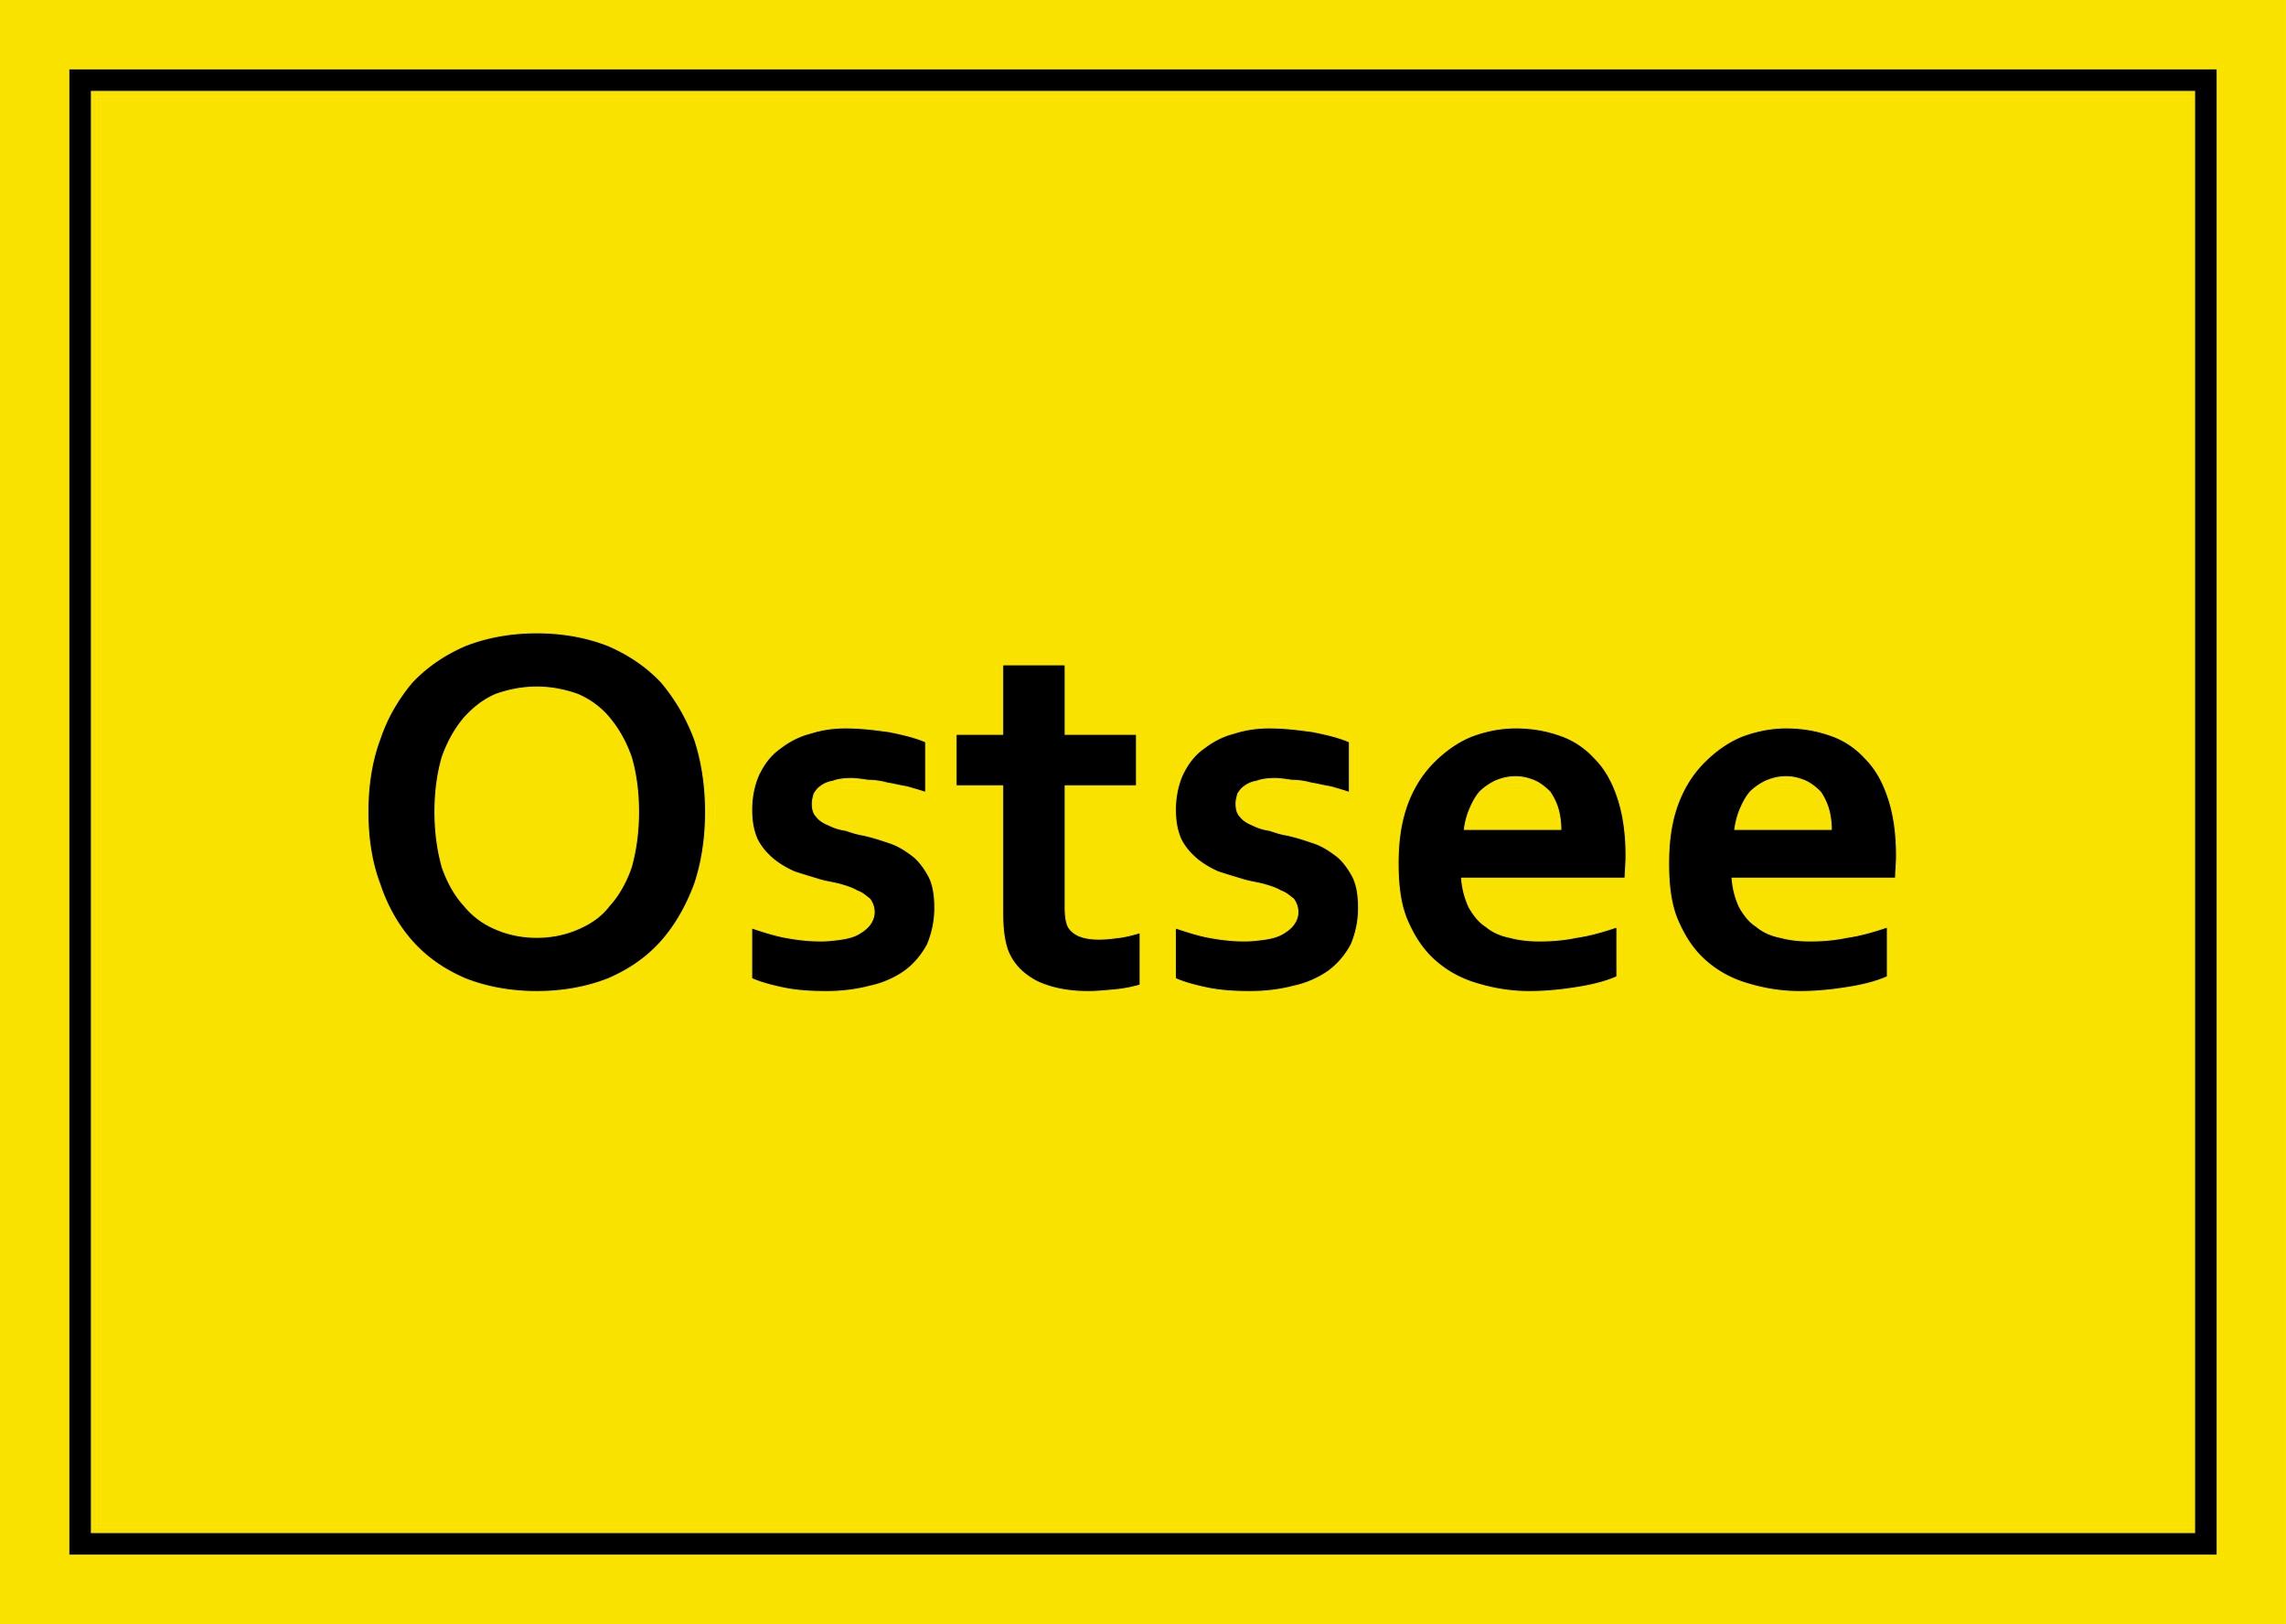 Aufkleber Ostsee – Bild 1